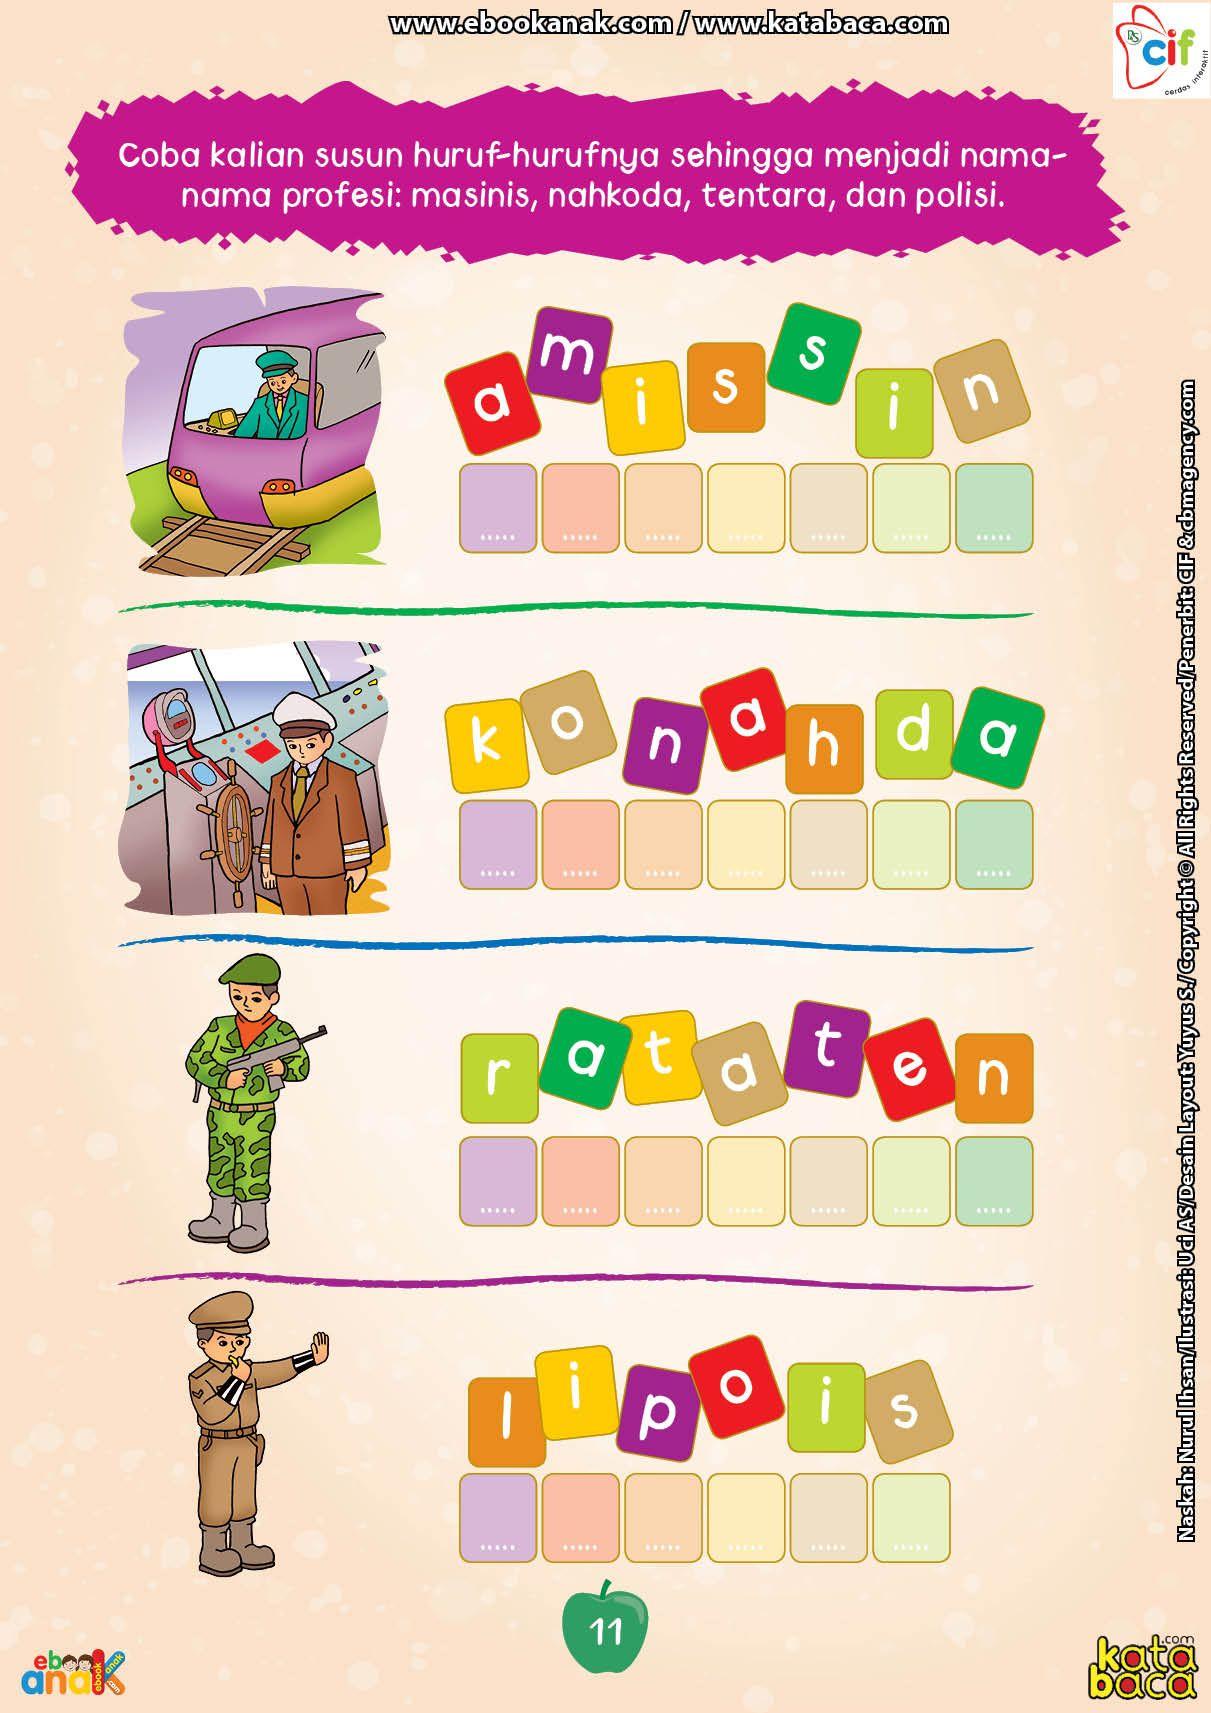 Baca Buku Online Brain Games Calistung11 Menyusun Huruf